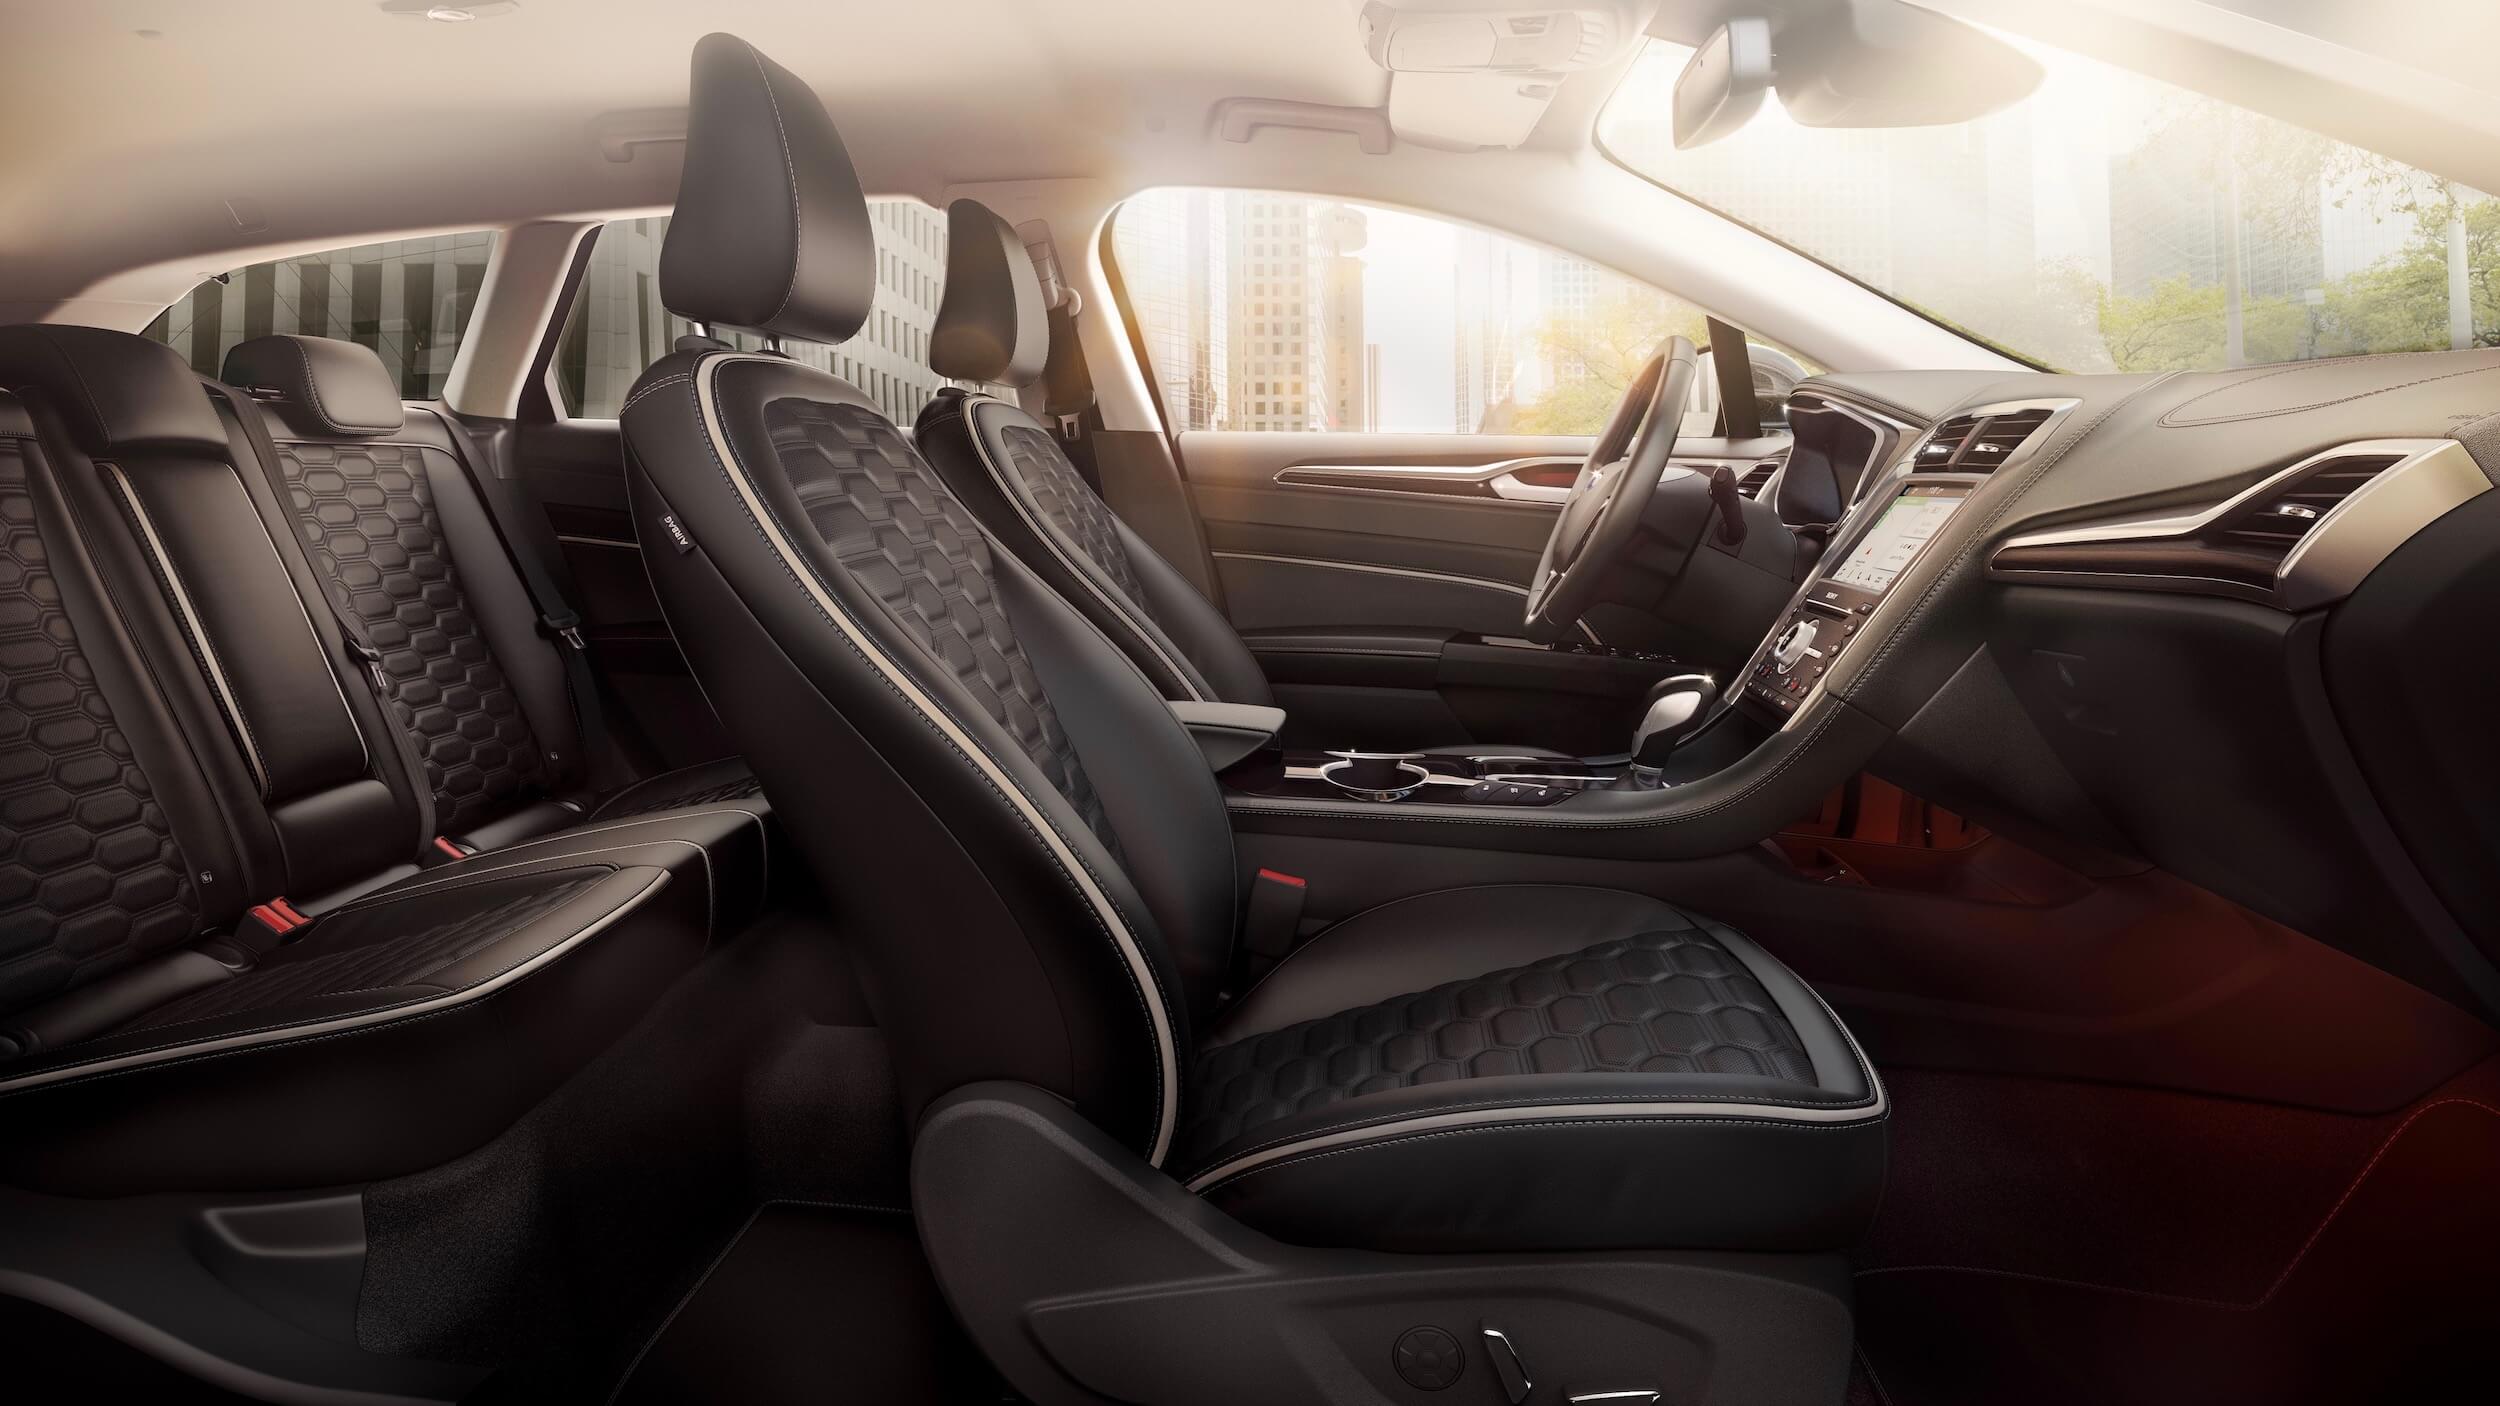 Hybride Ford Mondeo cadeiras